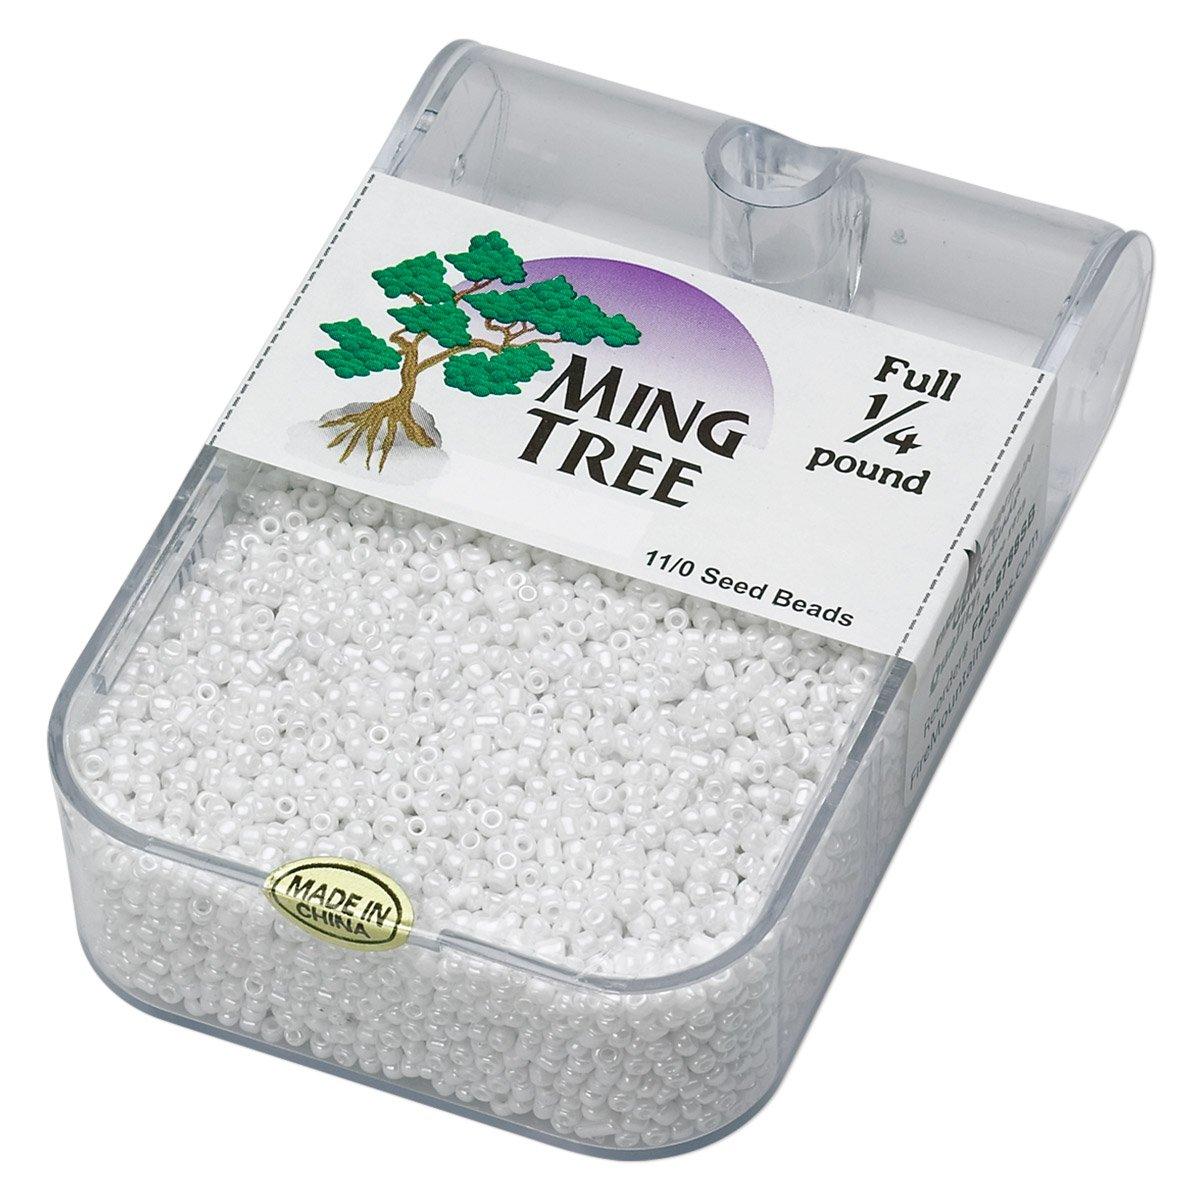 Ming Tree full 1/4 lb 11/0 seed beads White Luster